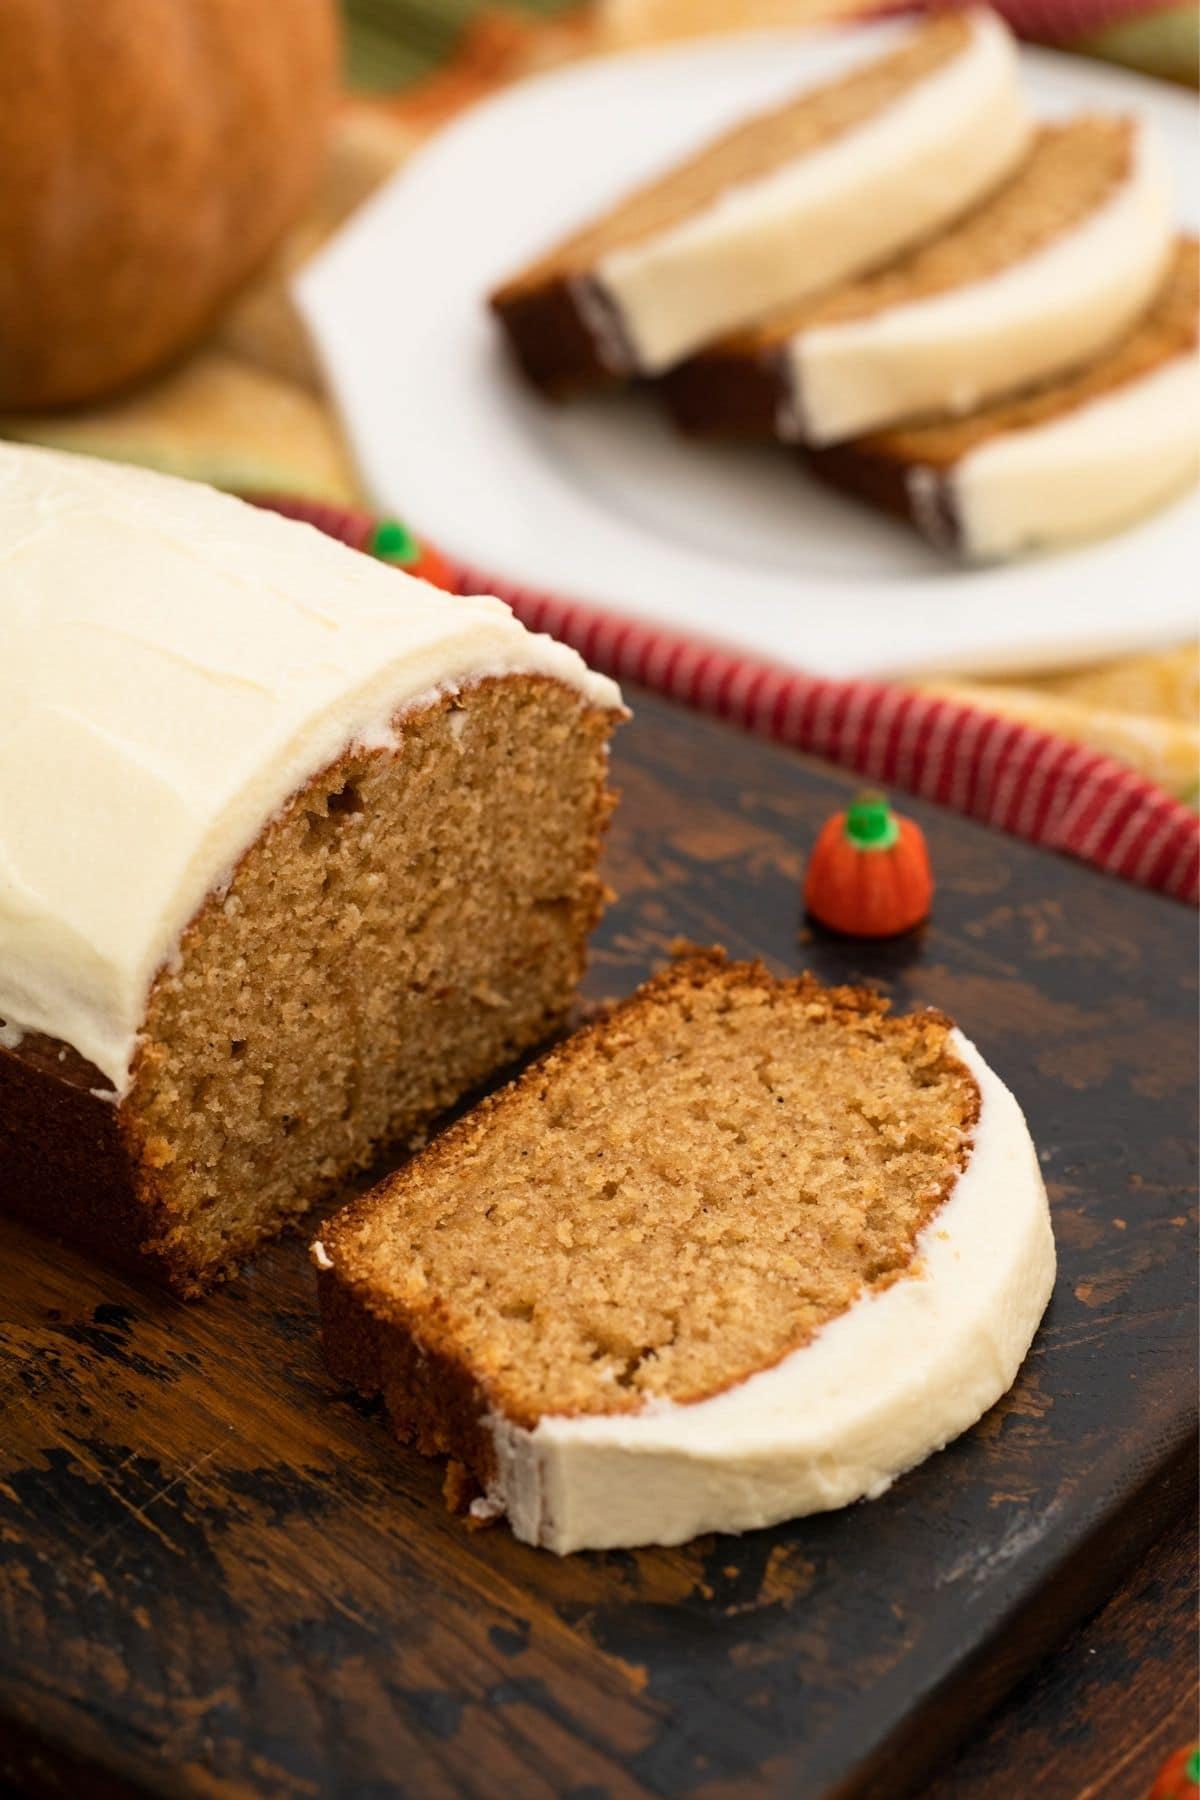 Half loaf of pumpkin bread on board next to saucer of sliced bread